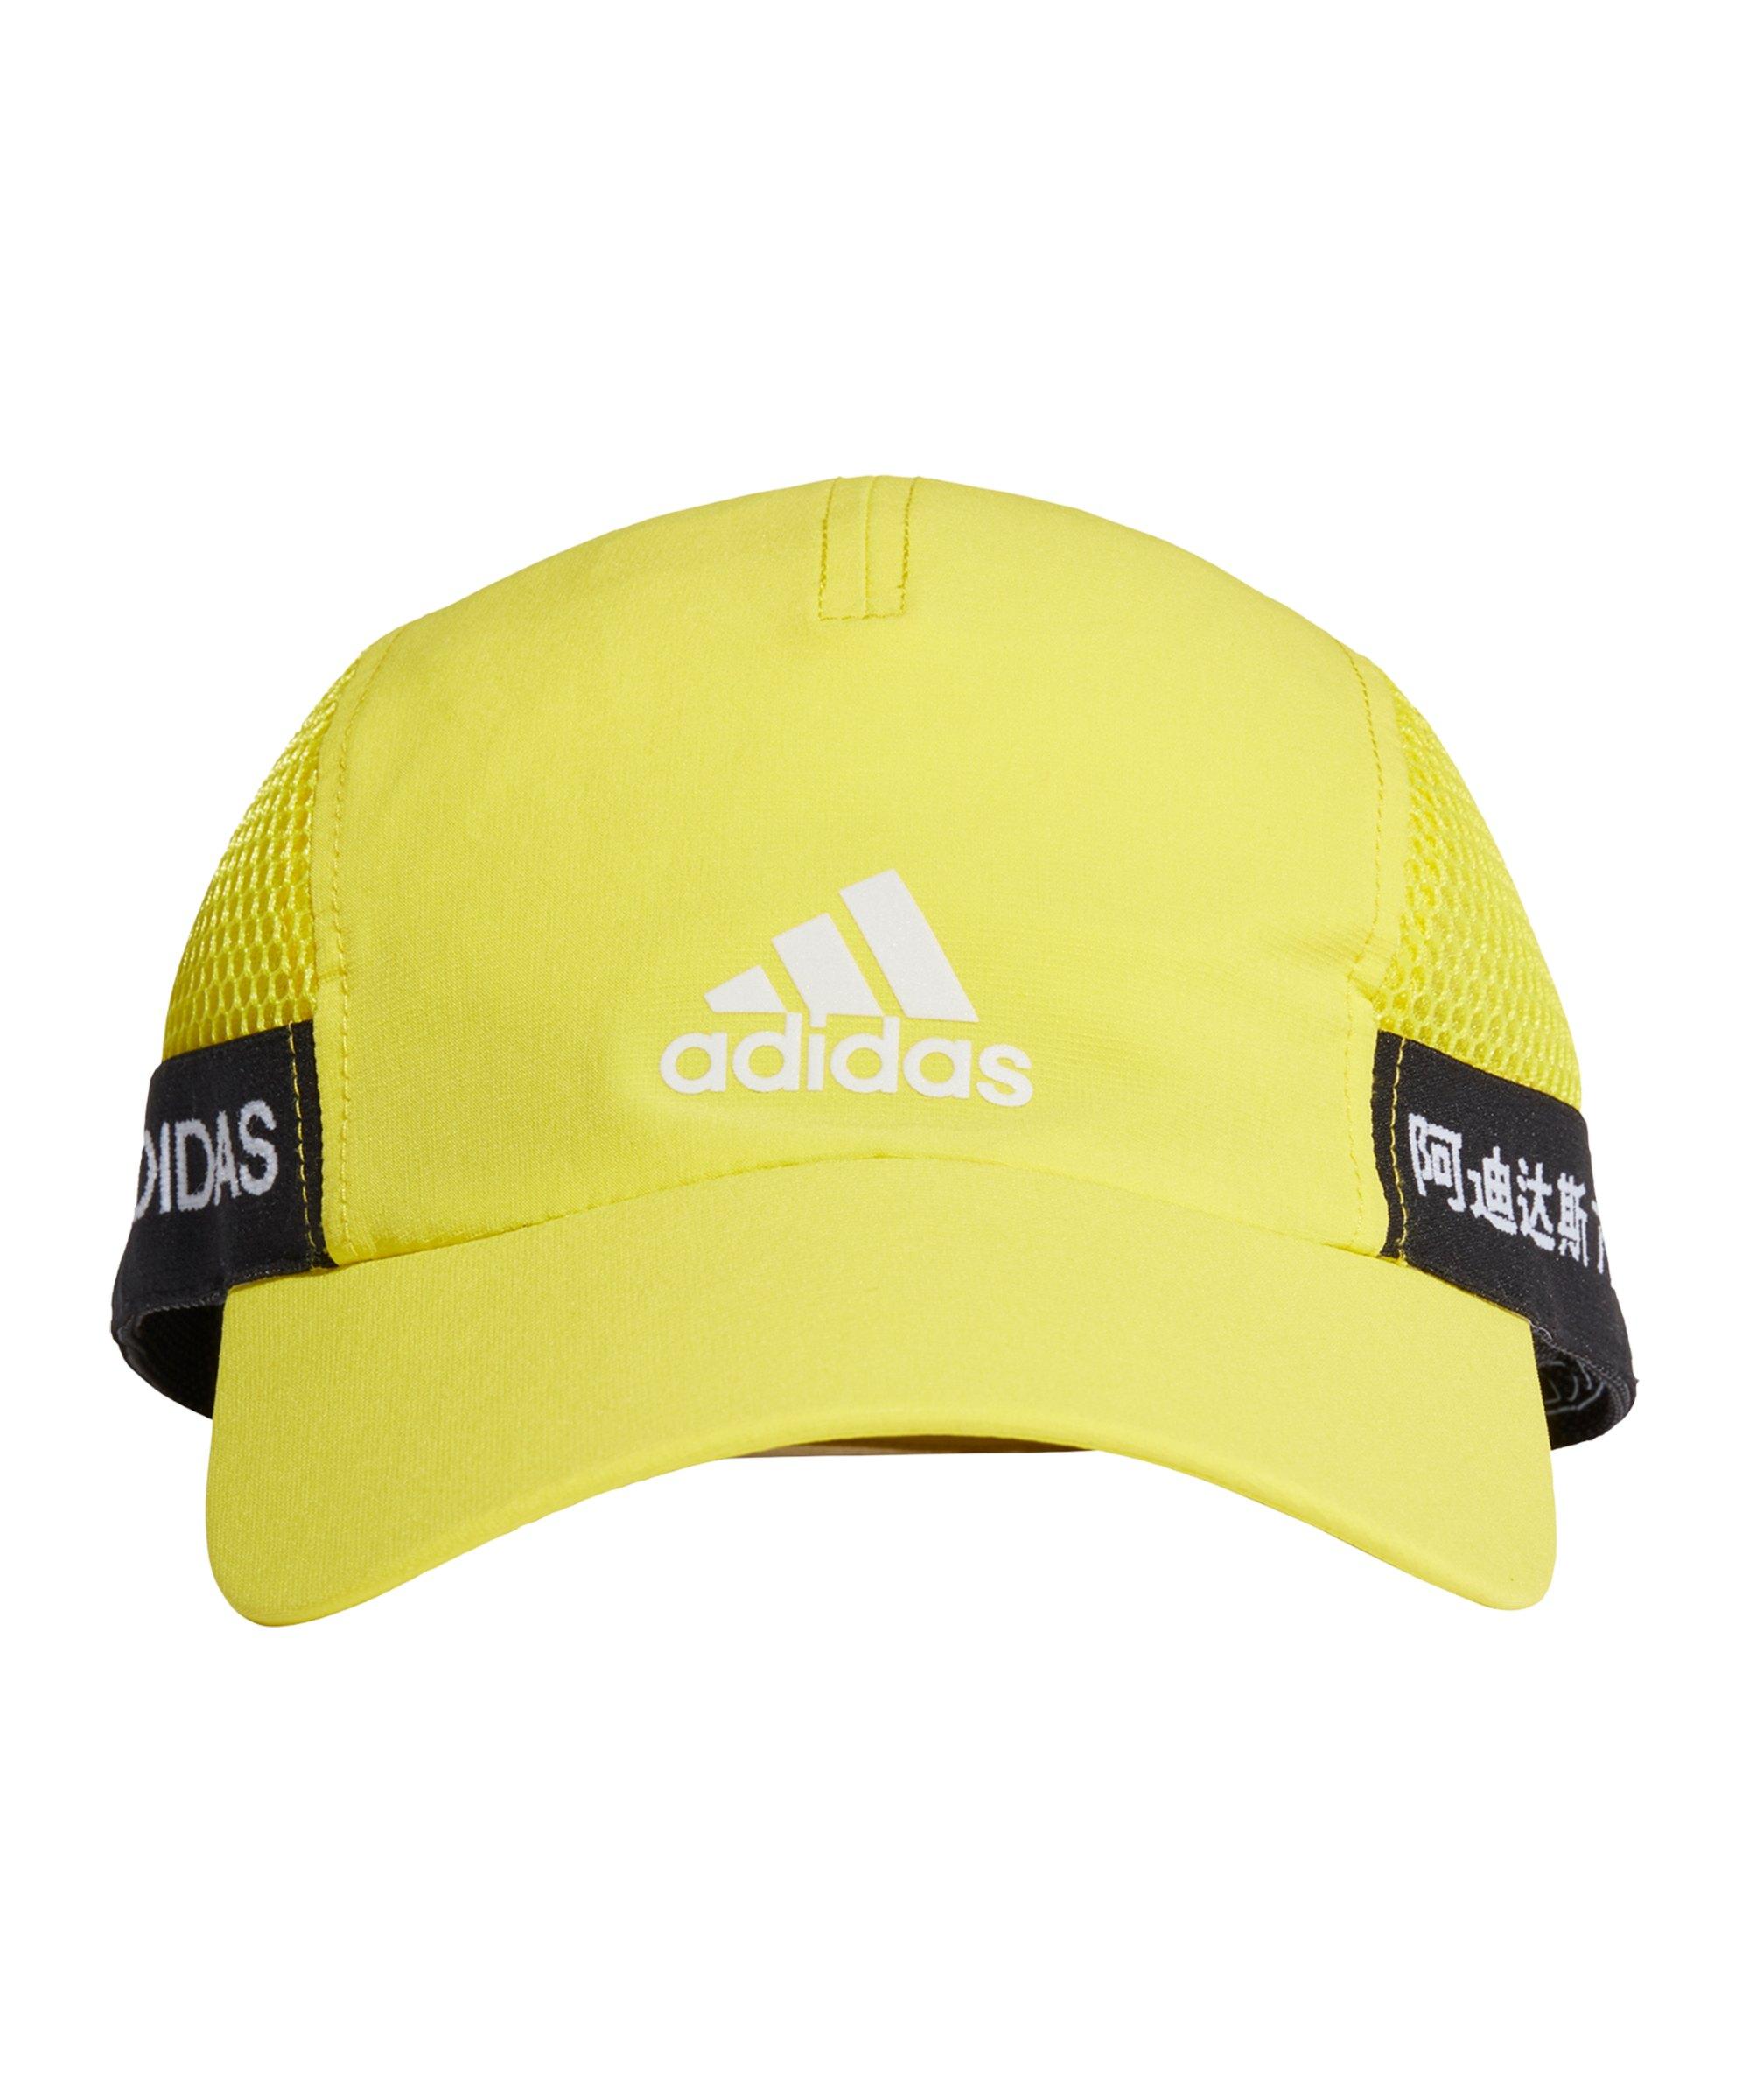 adidas Aeroready Runner Cap Gelb Schwarz - gelb